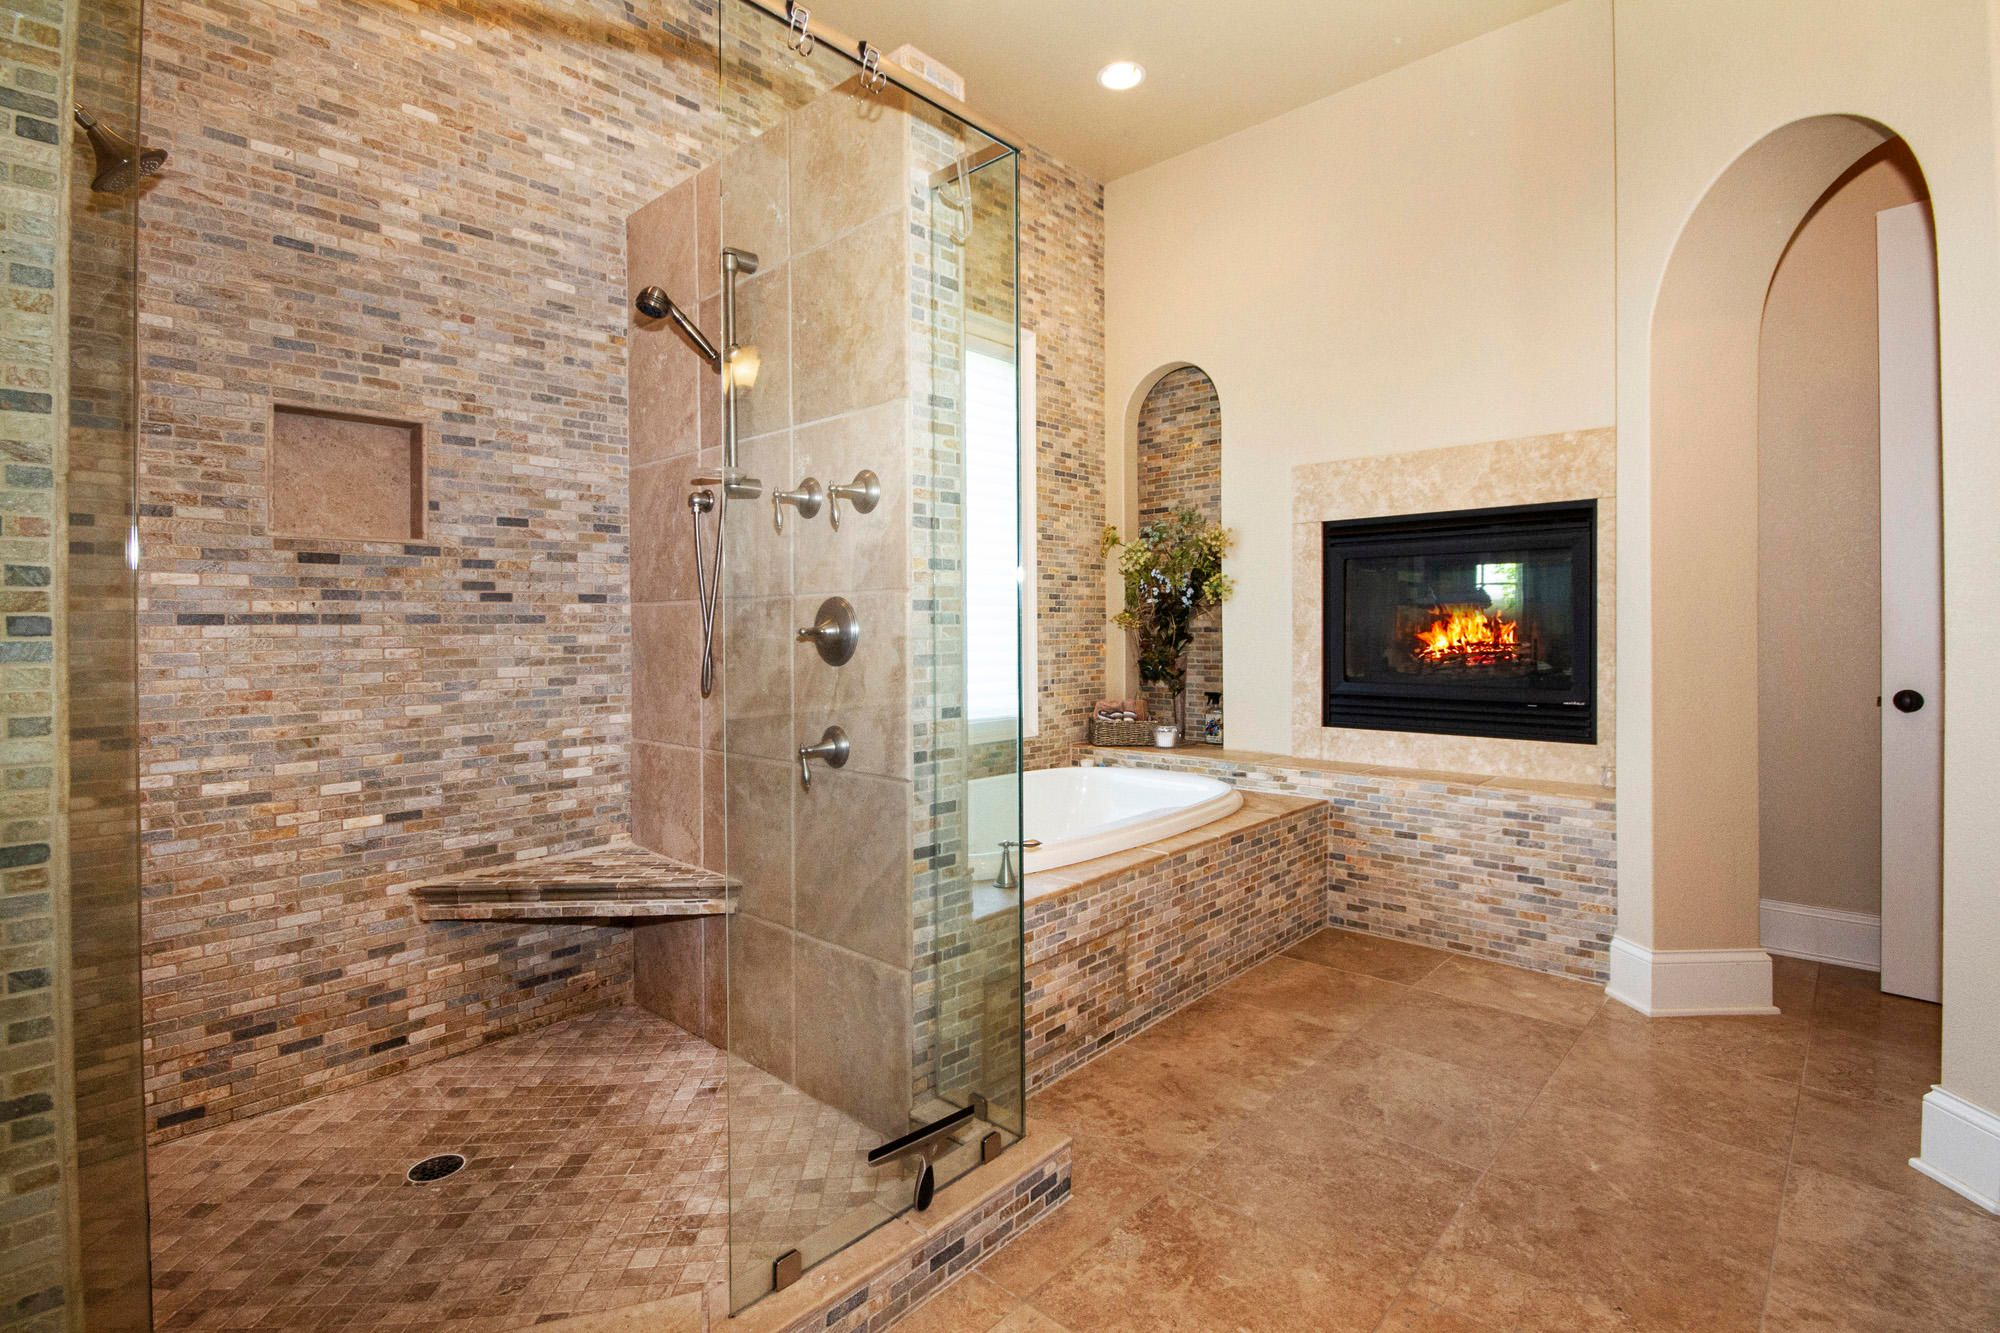 Spa Inspired Master Bath!